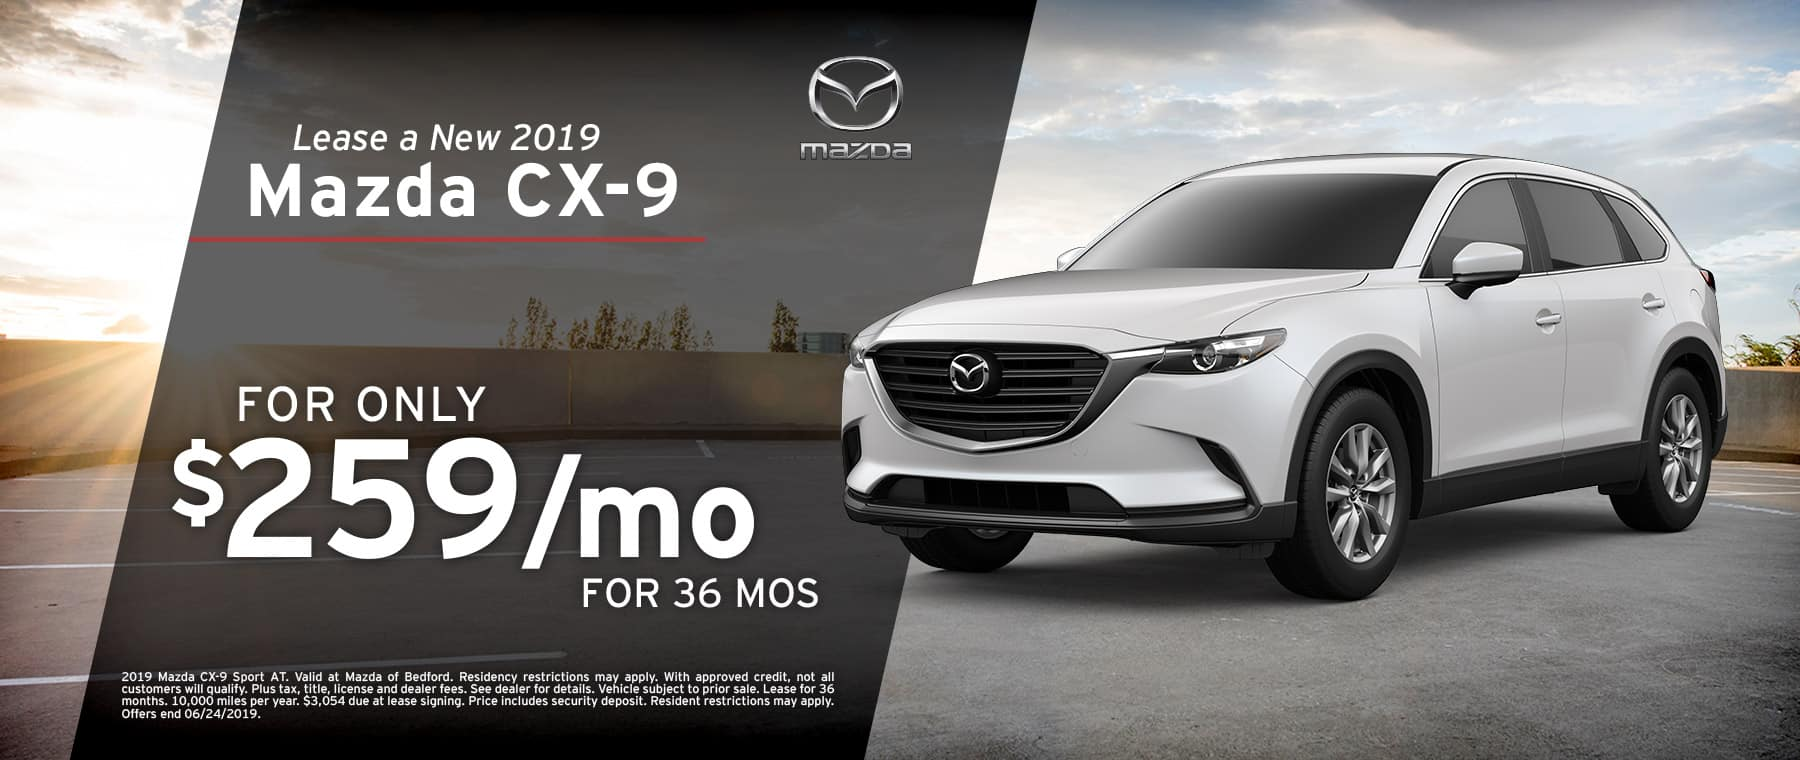 2019 Mazda CX-9 Lease Offer